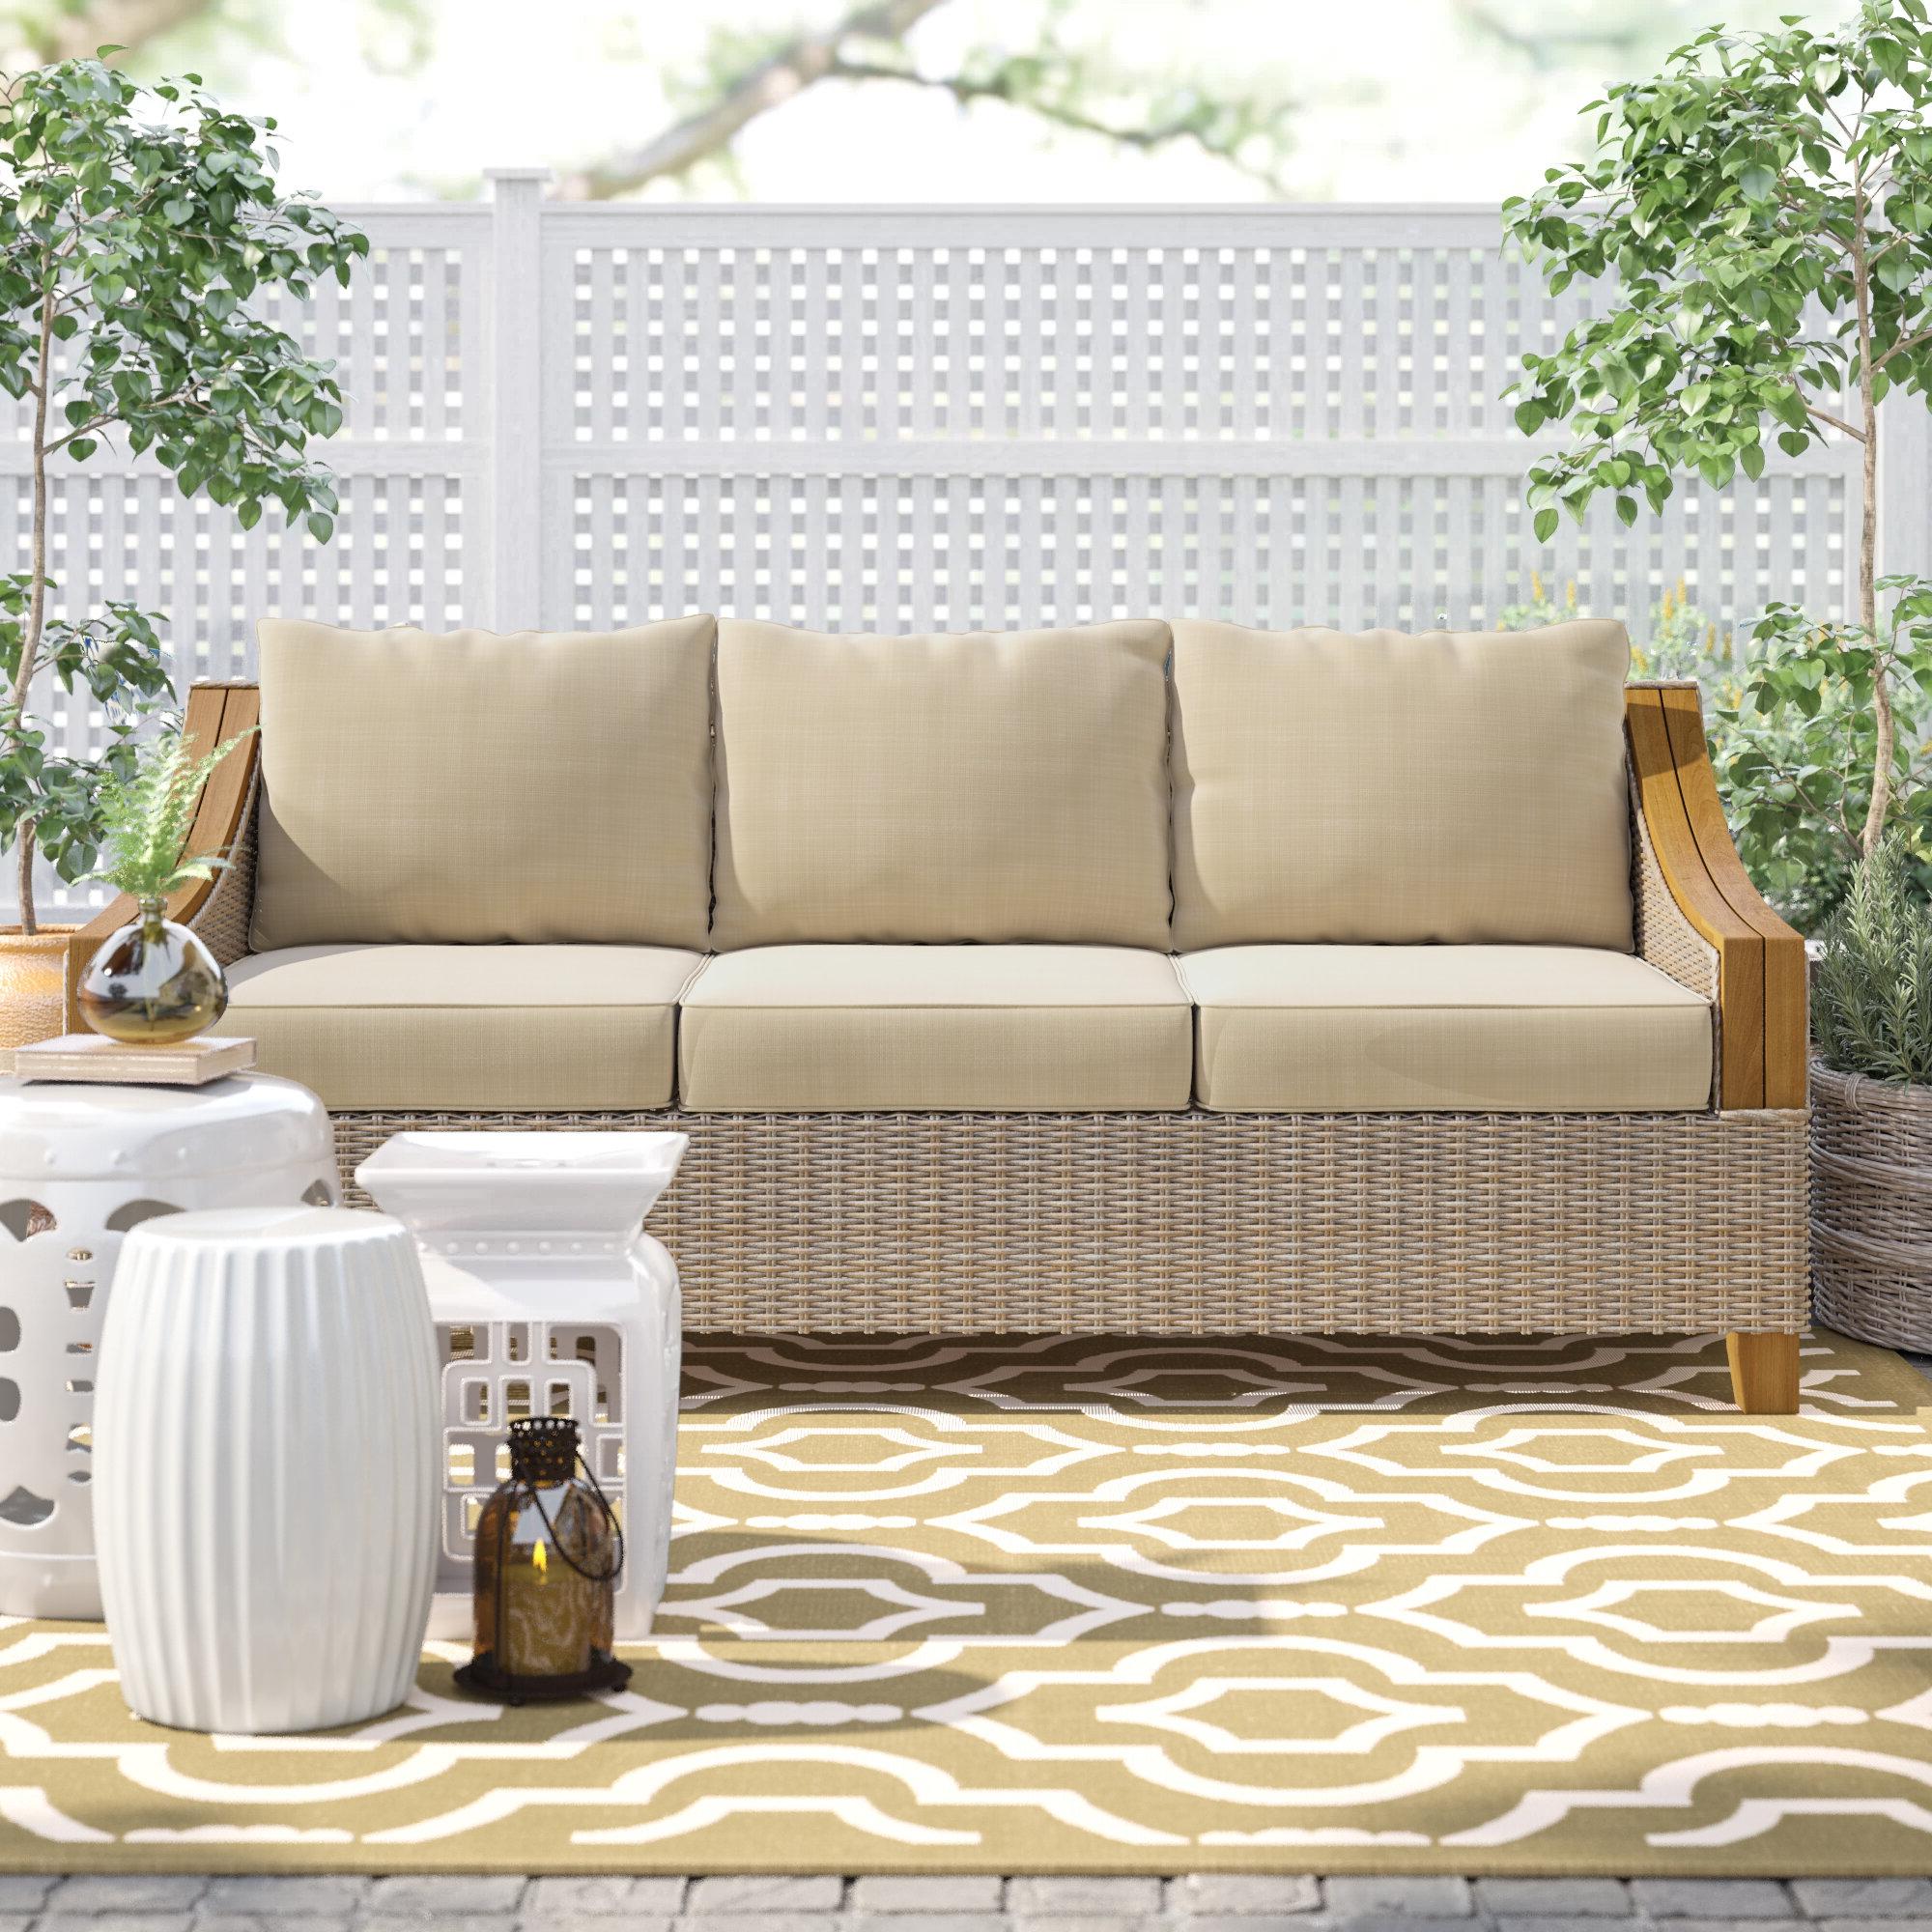 Popular Kincaid Teak Patio Sofa With Sunbrella Cushions In Kincaid Teak Patio Sofas With Sunbrella Cushions (View 3 of 25)